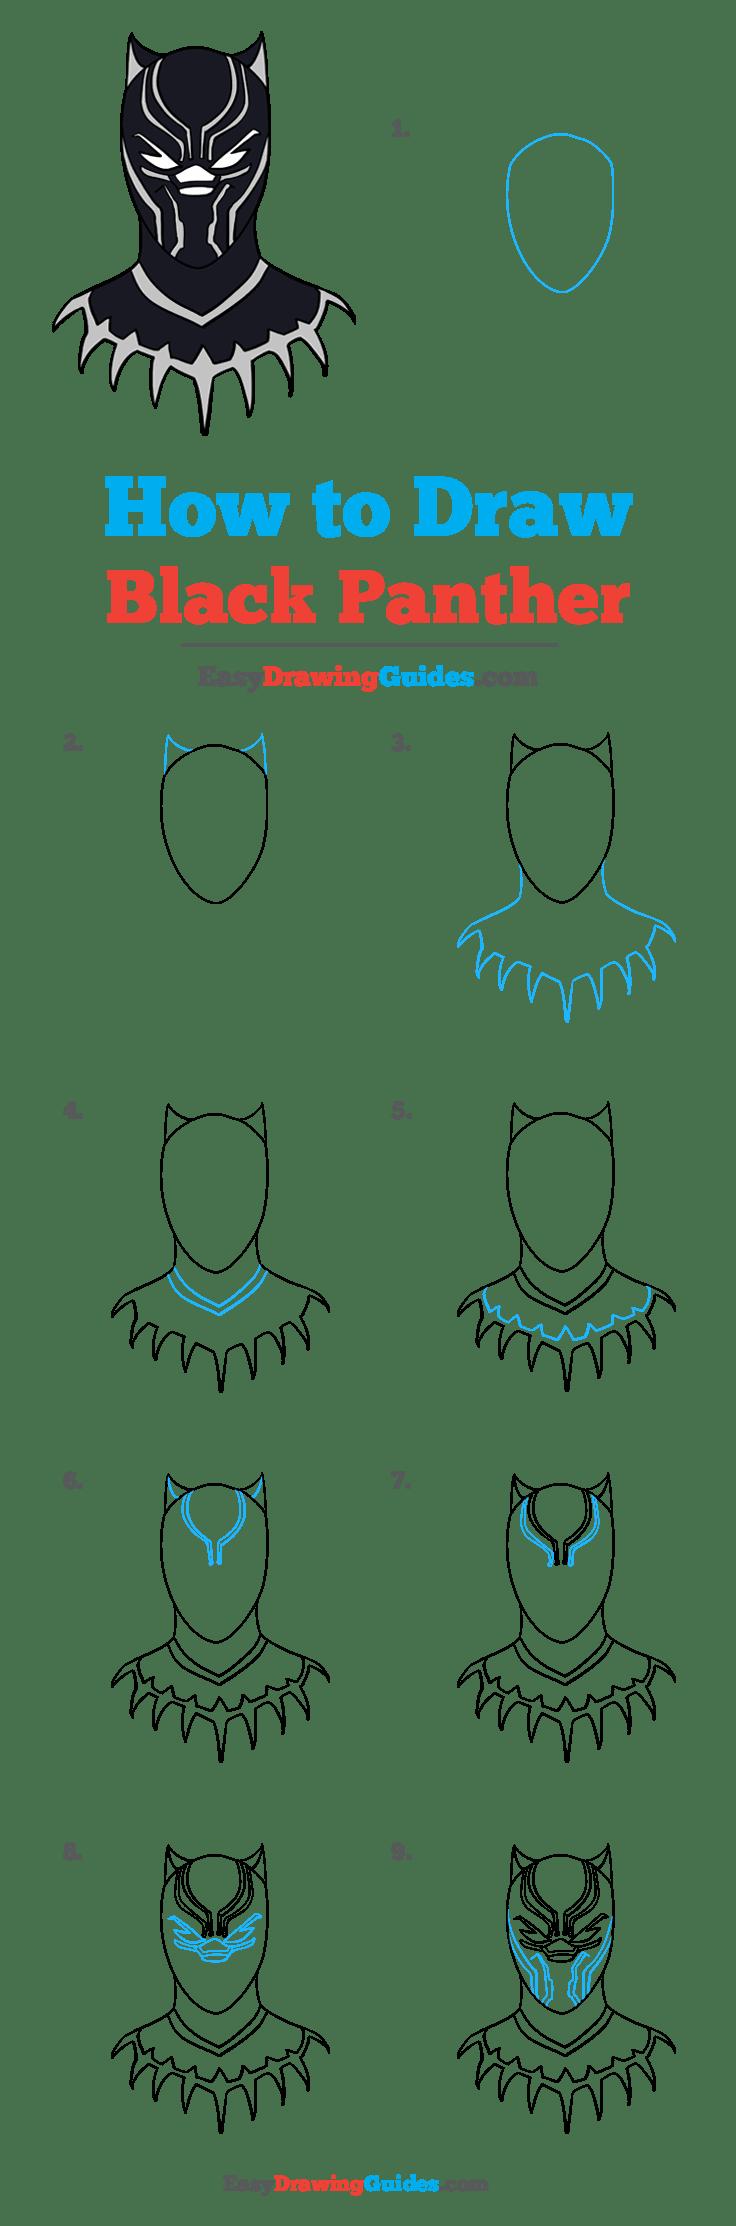 Easy Black Panther Drawing : black, panther, drawing, Black, Panther, Really, Drawing, Tutorial